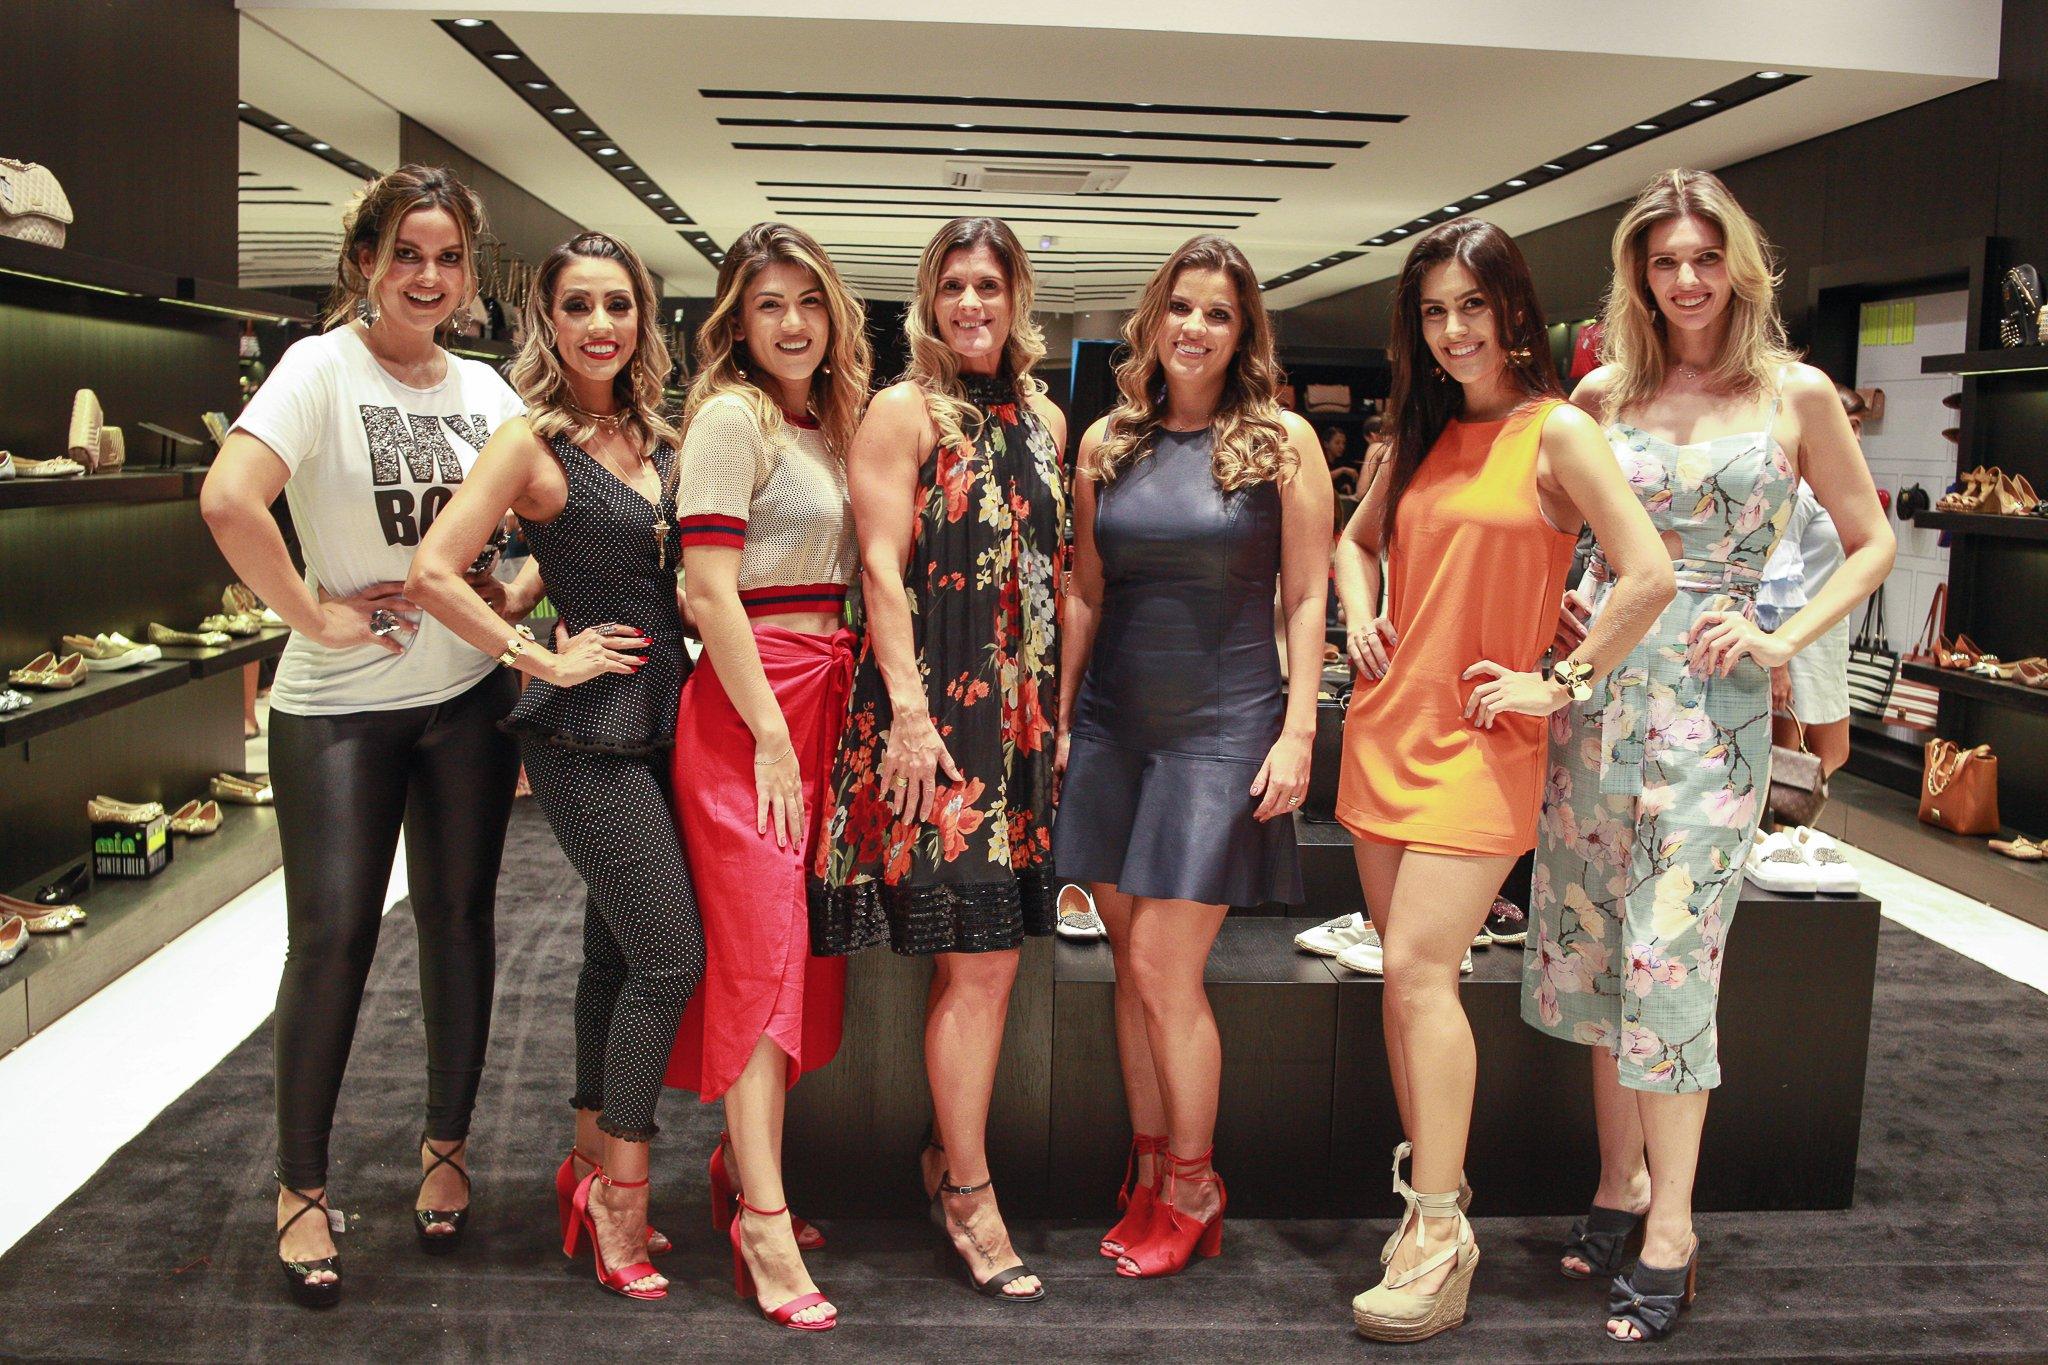 Camila Peara, Sara Coragem, Letícia Coelho, Roberta Leal, Rafaella Machado, Maria Clara e Kassandra Valduga